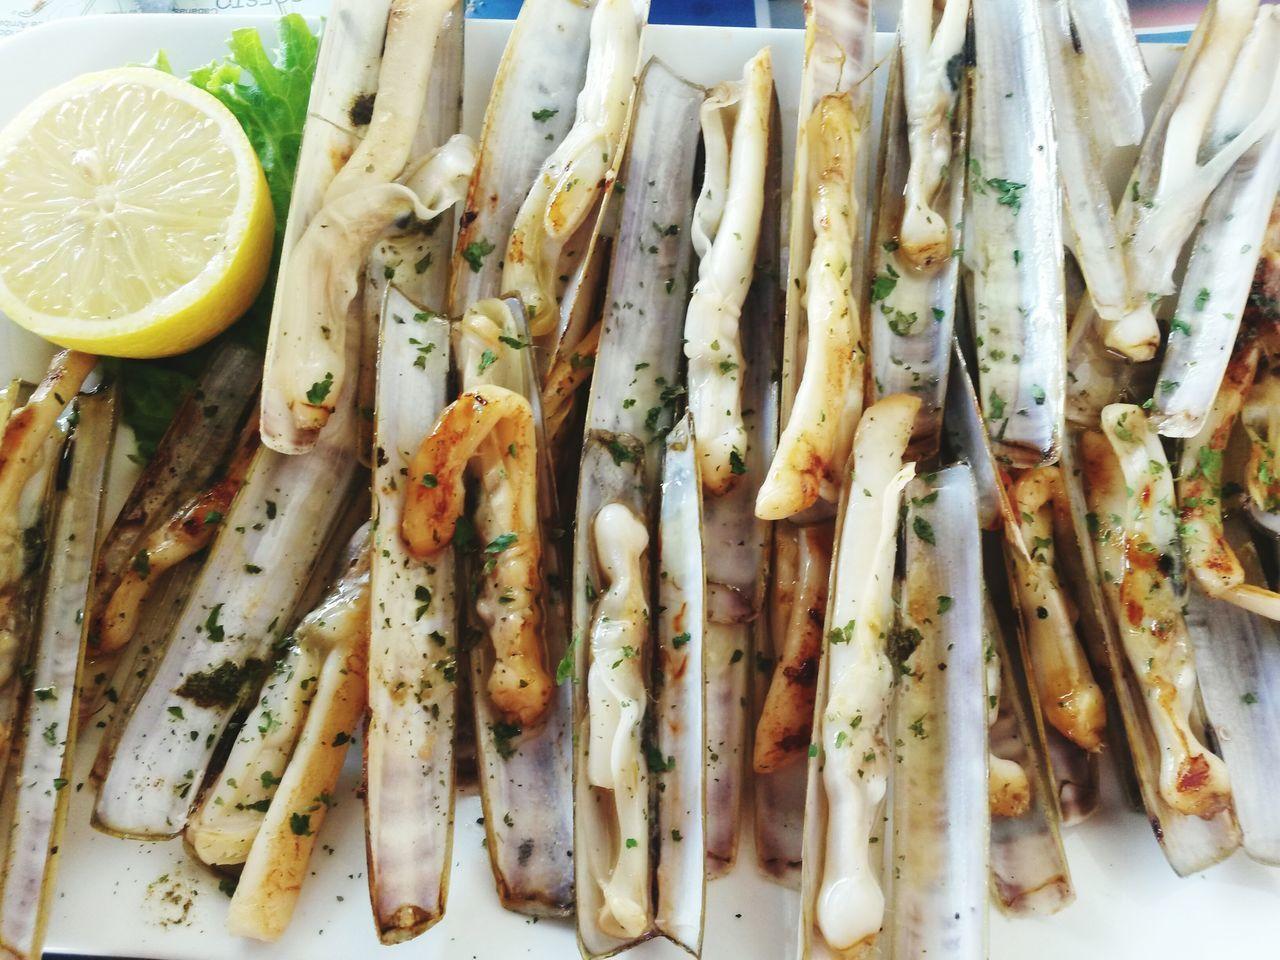 My World Of Food Navajas Galicia Galiza Galiciamagica Food Marisco